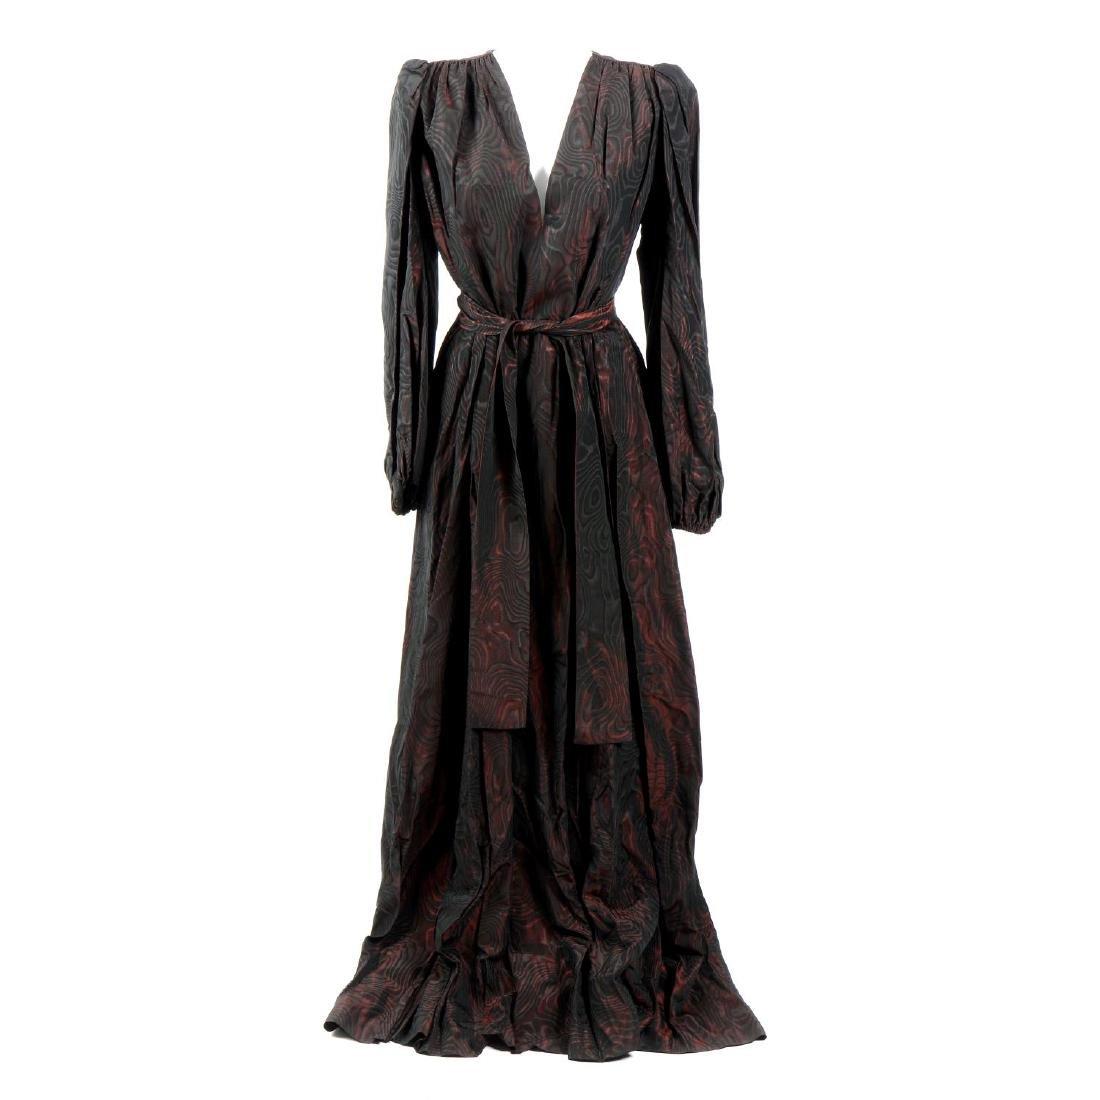 YVES SAINT LAURENT - a Rive Gauche dress. The 1970s